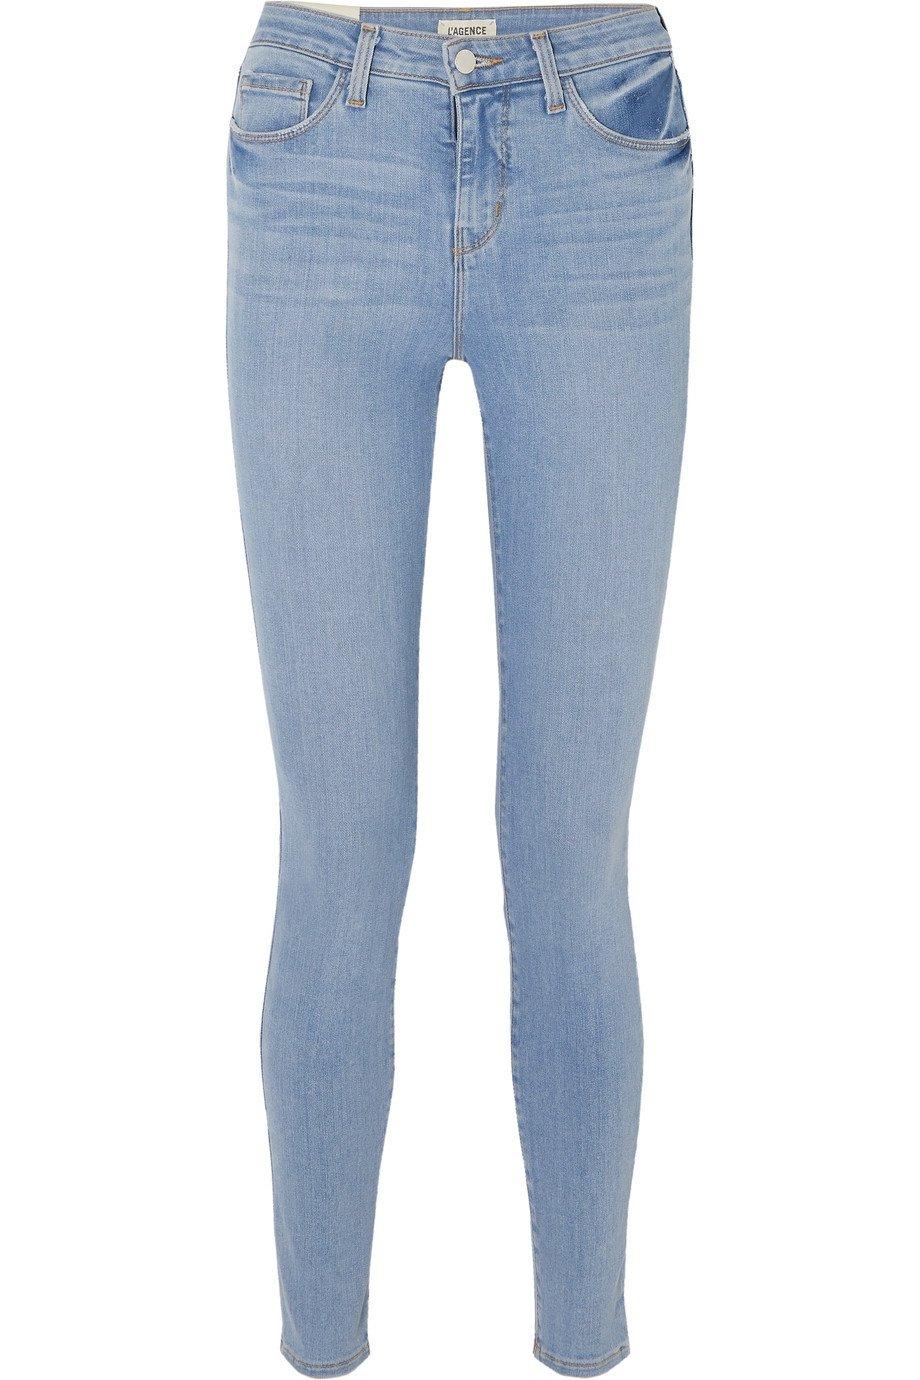 L'Agence | Marguerite high-rise skinny jeans | NET-A-PORTER.COM